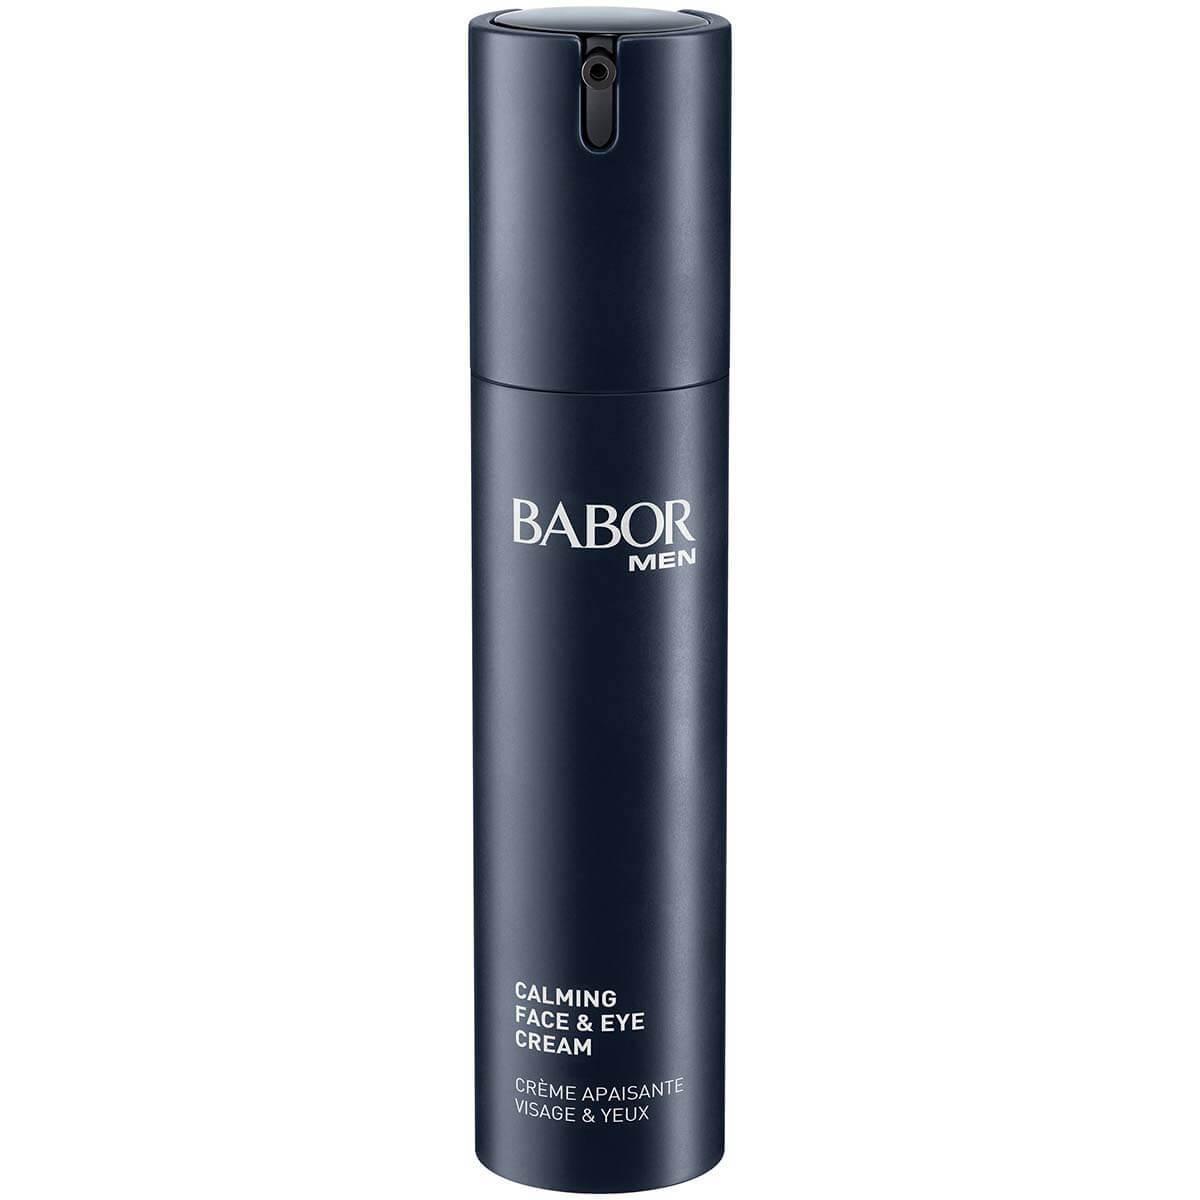 Крем для лица и глаз Babor Men Calming Face & Eye cream 50 мл для мужчин